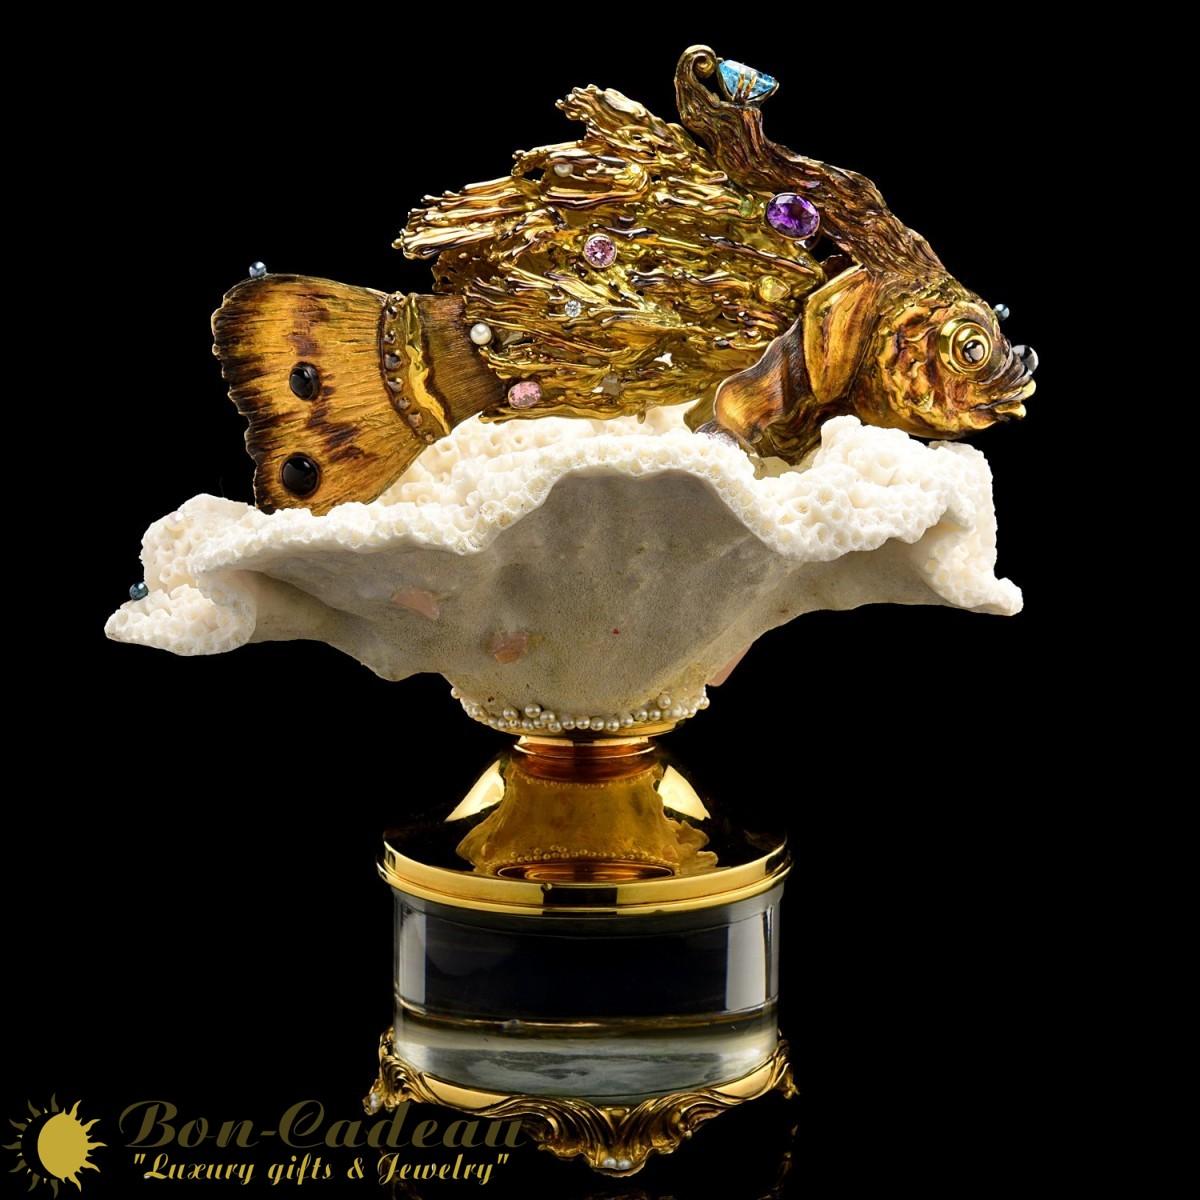 Скульптура Золотая рыбка (серебро, коралл, аметисты)